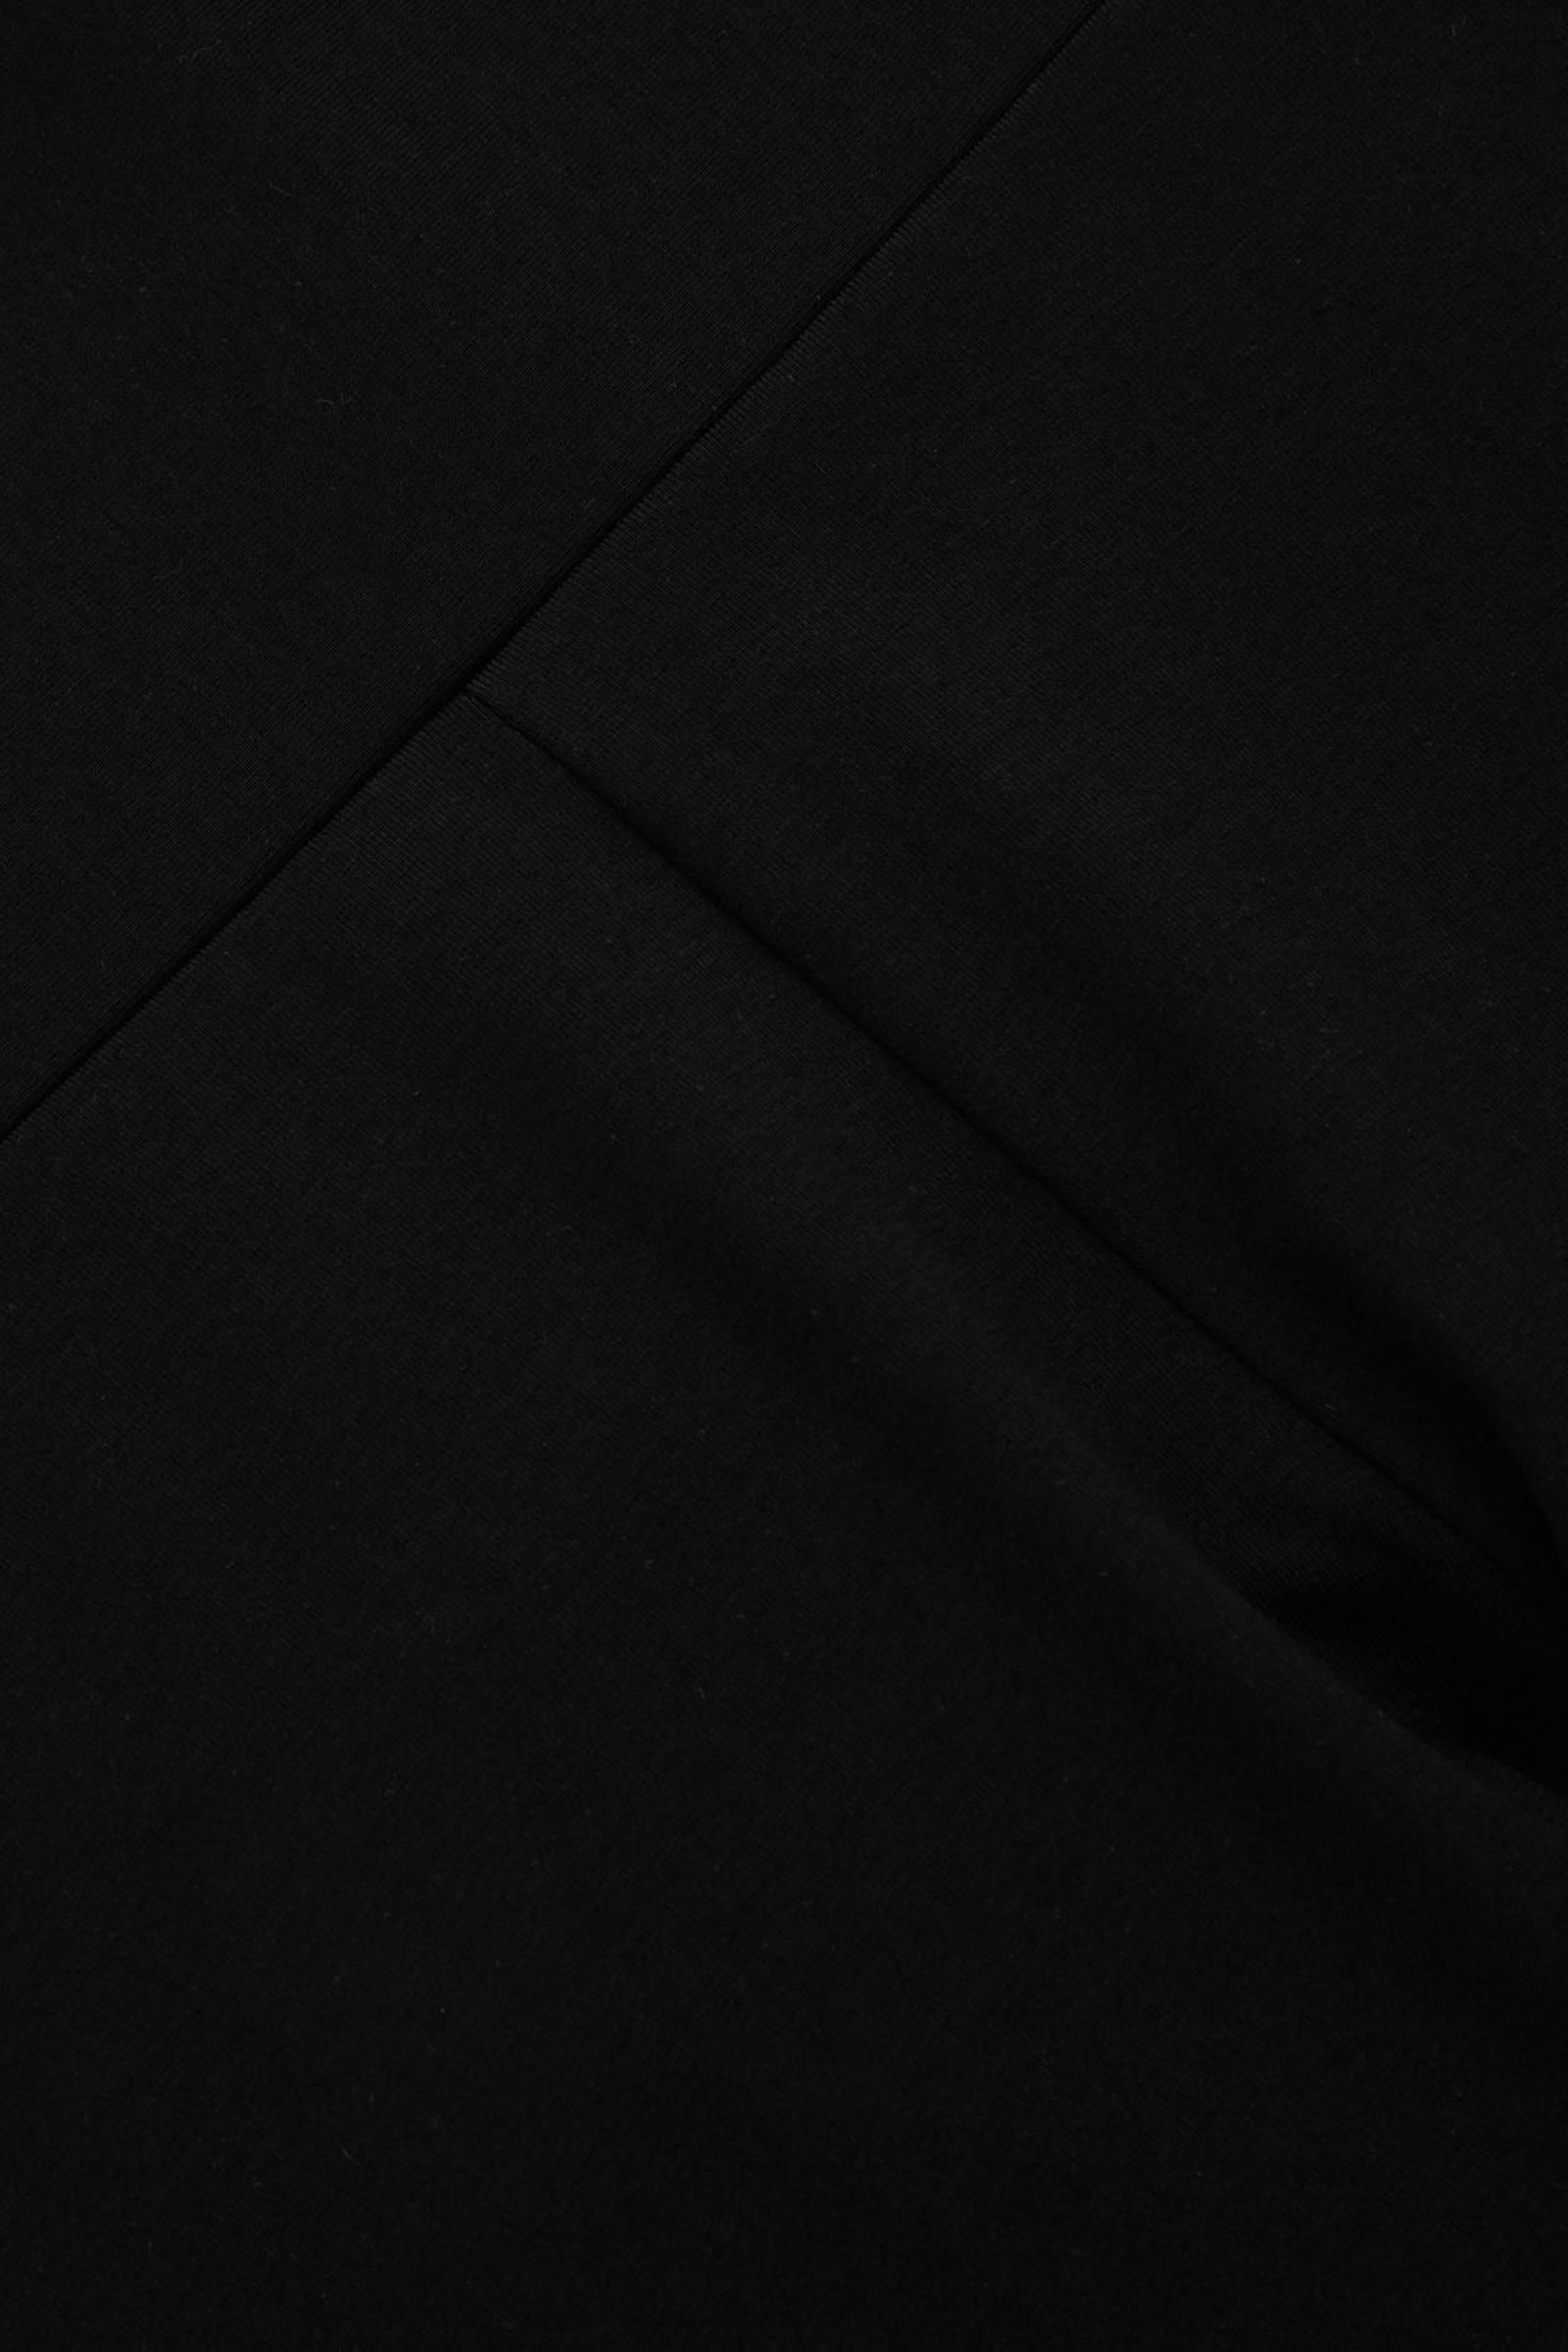 COS 코튼 저지 슬림핏 쇼츠의 블랙컬러 Detail입니다.